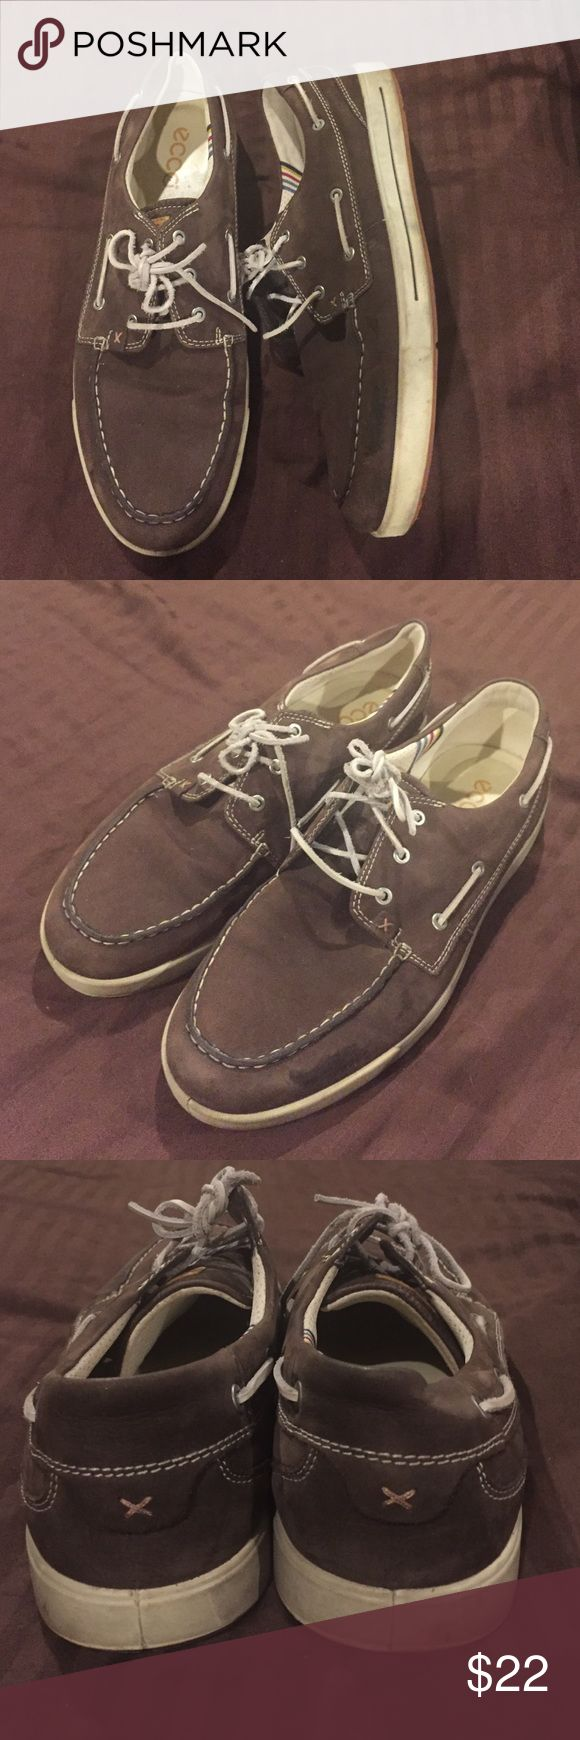 25+ best Brown Boat Shoes ideas on Pinterest | Men's summer shoes ...